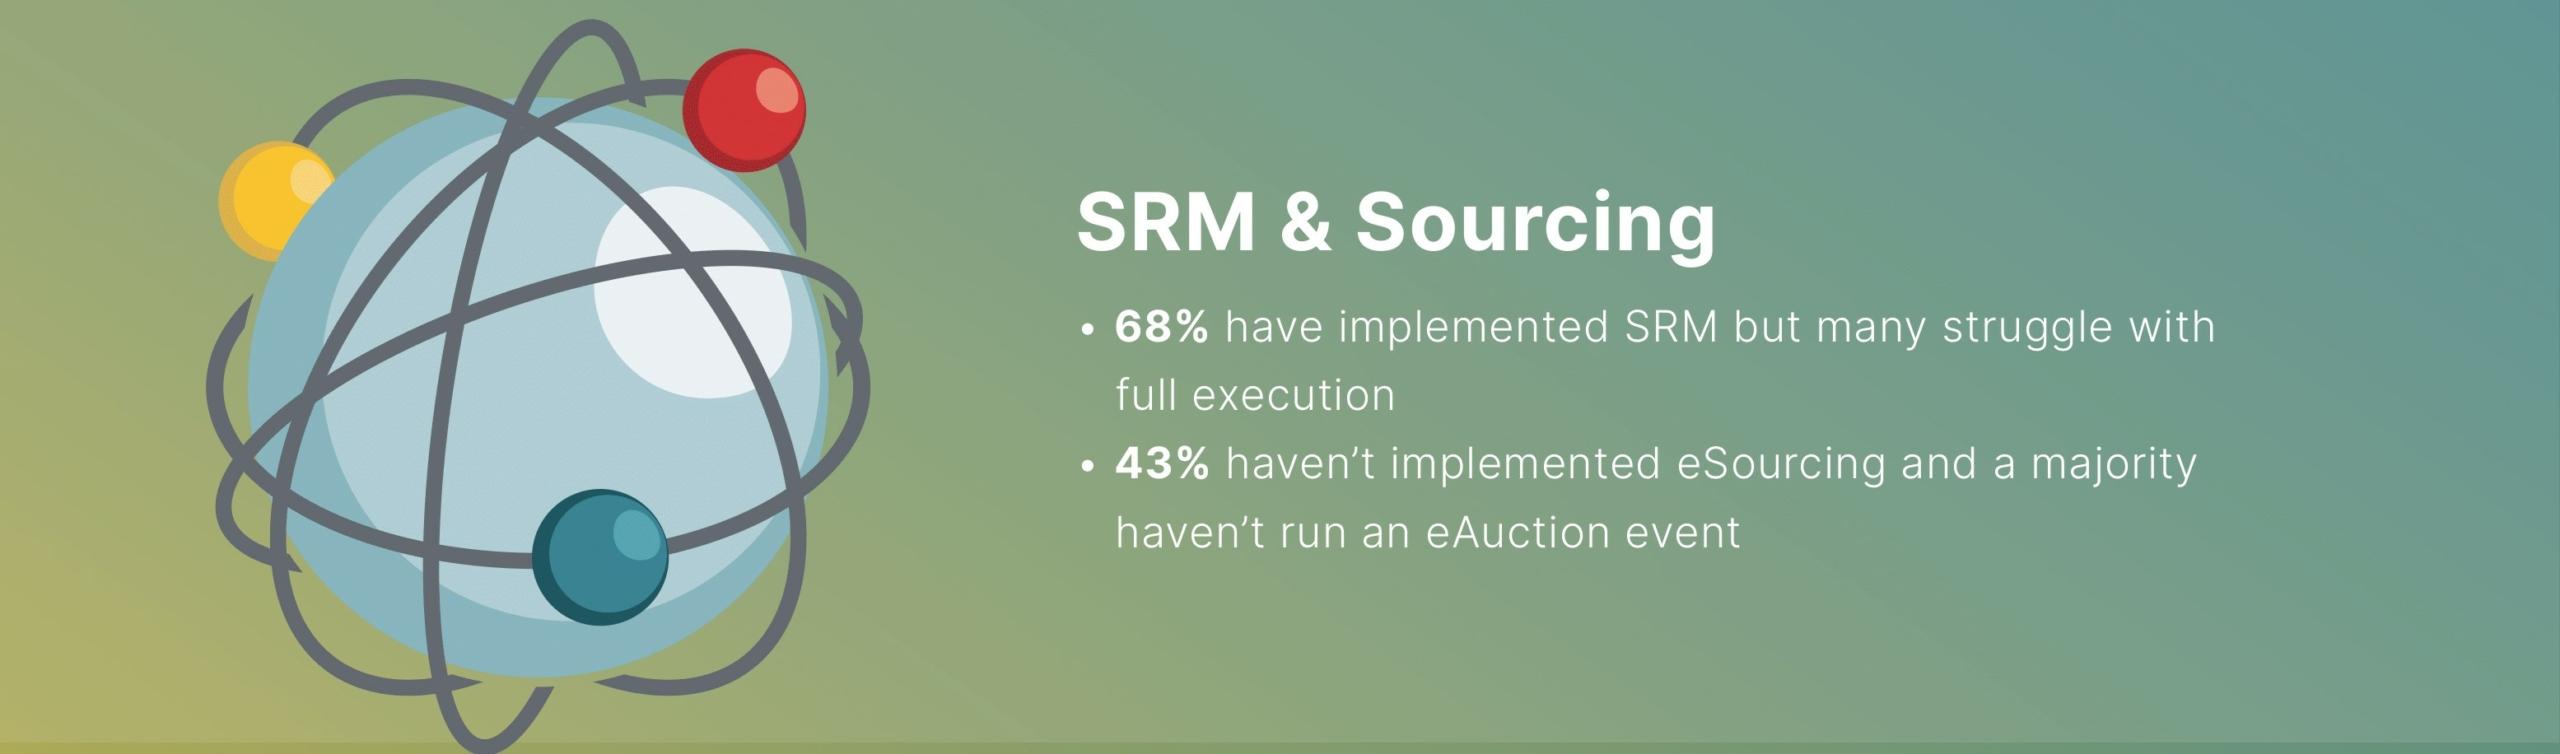 SRM & Sourcing